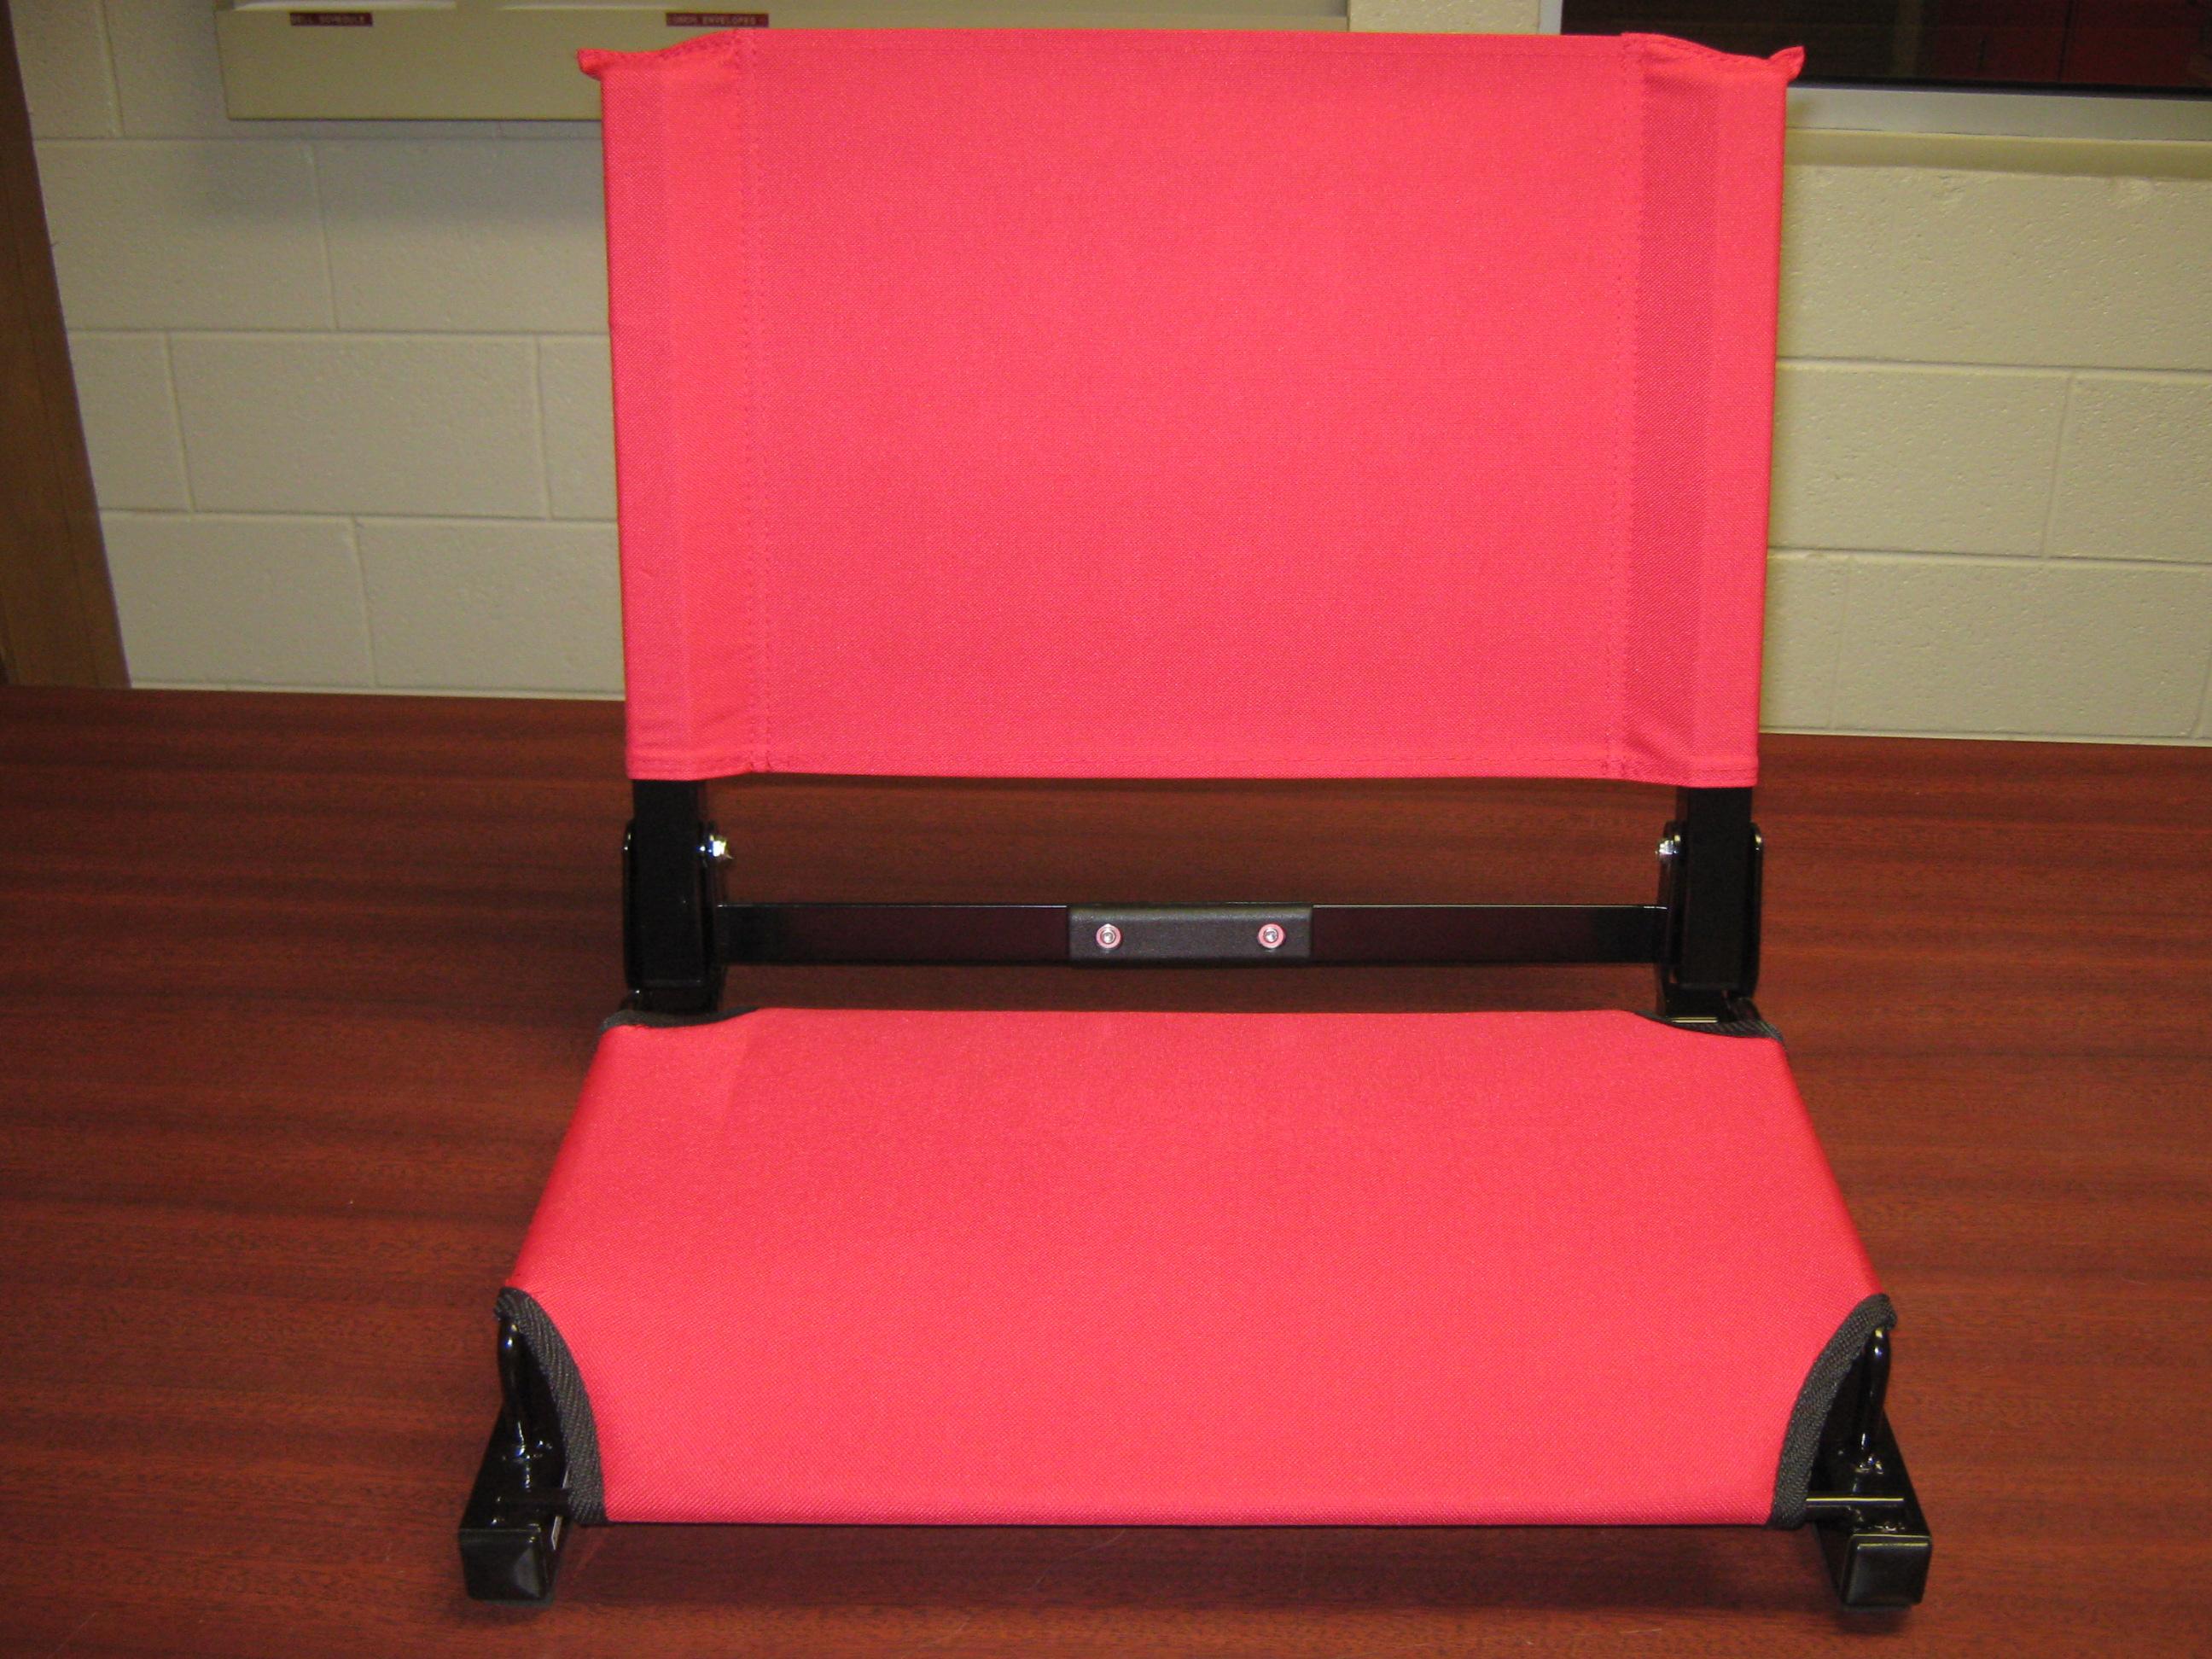 wrestling chairs for sale ergonomic office chair ebay bleacher seats reading high school sports